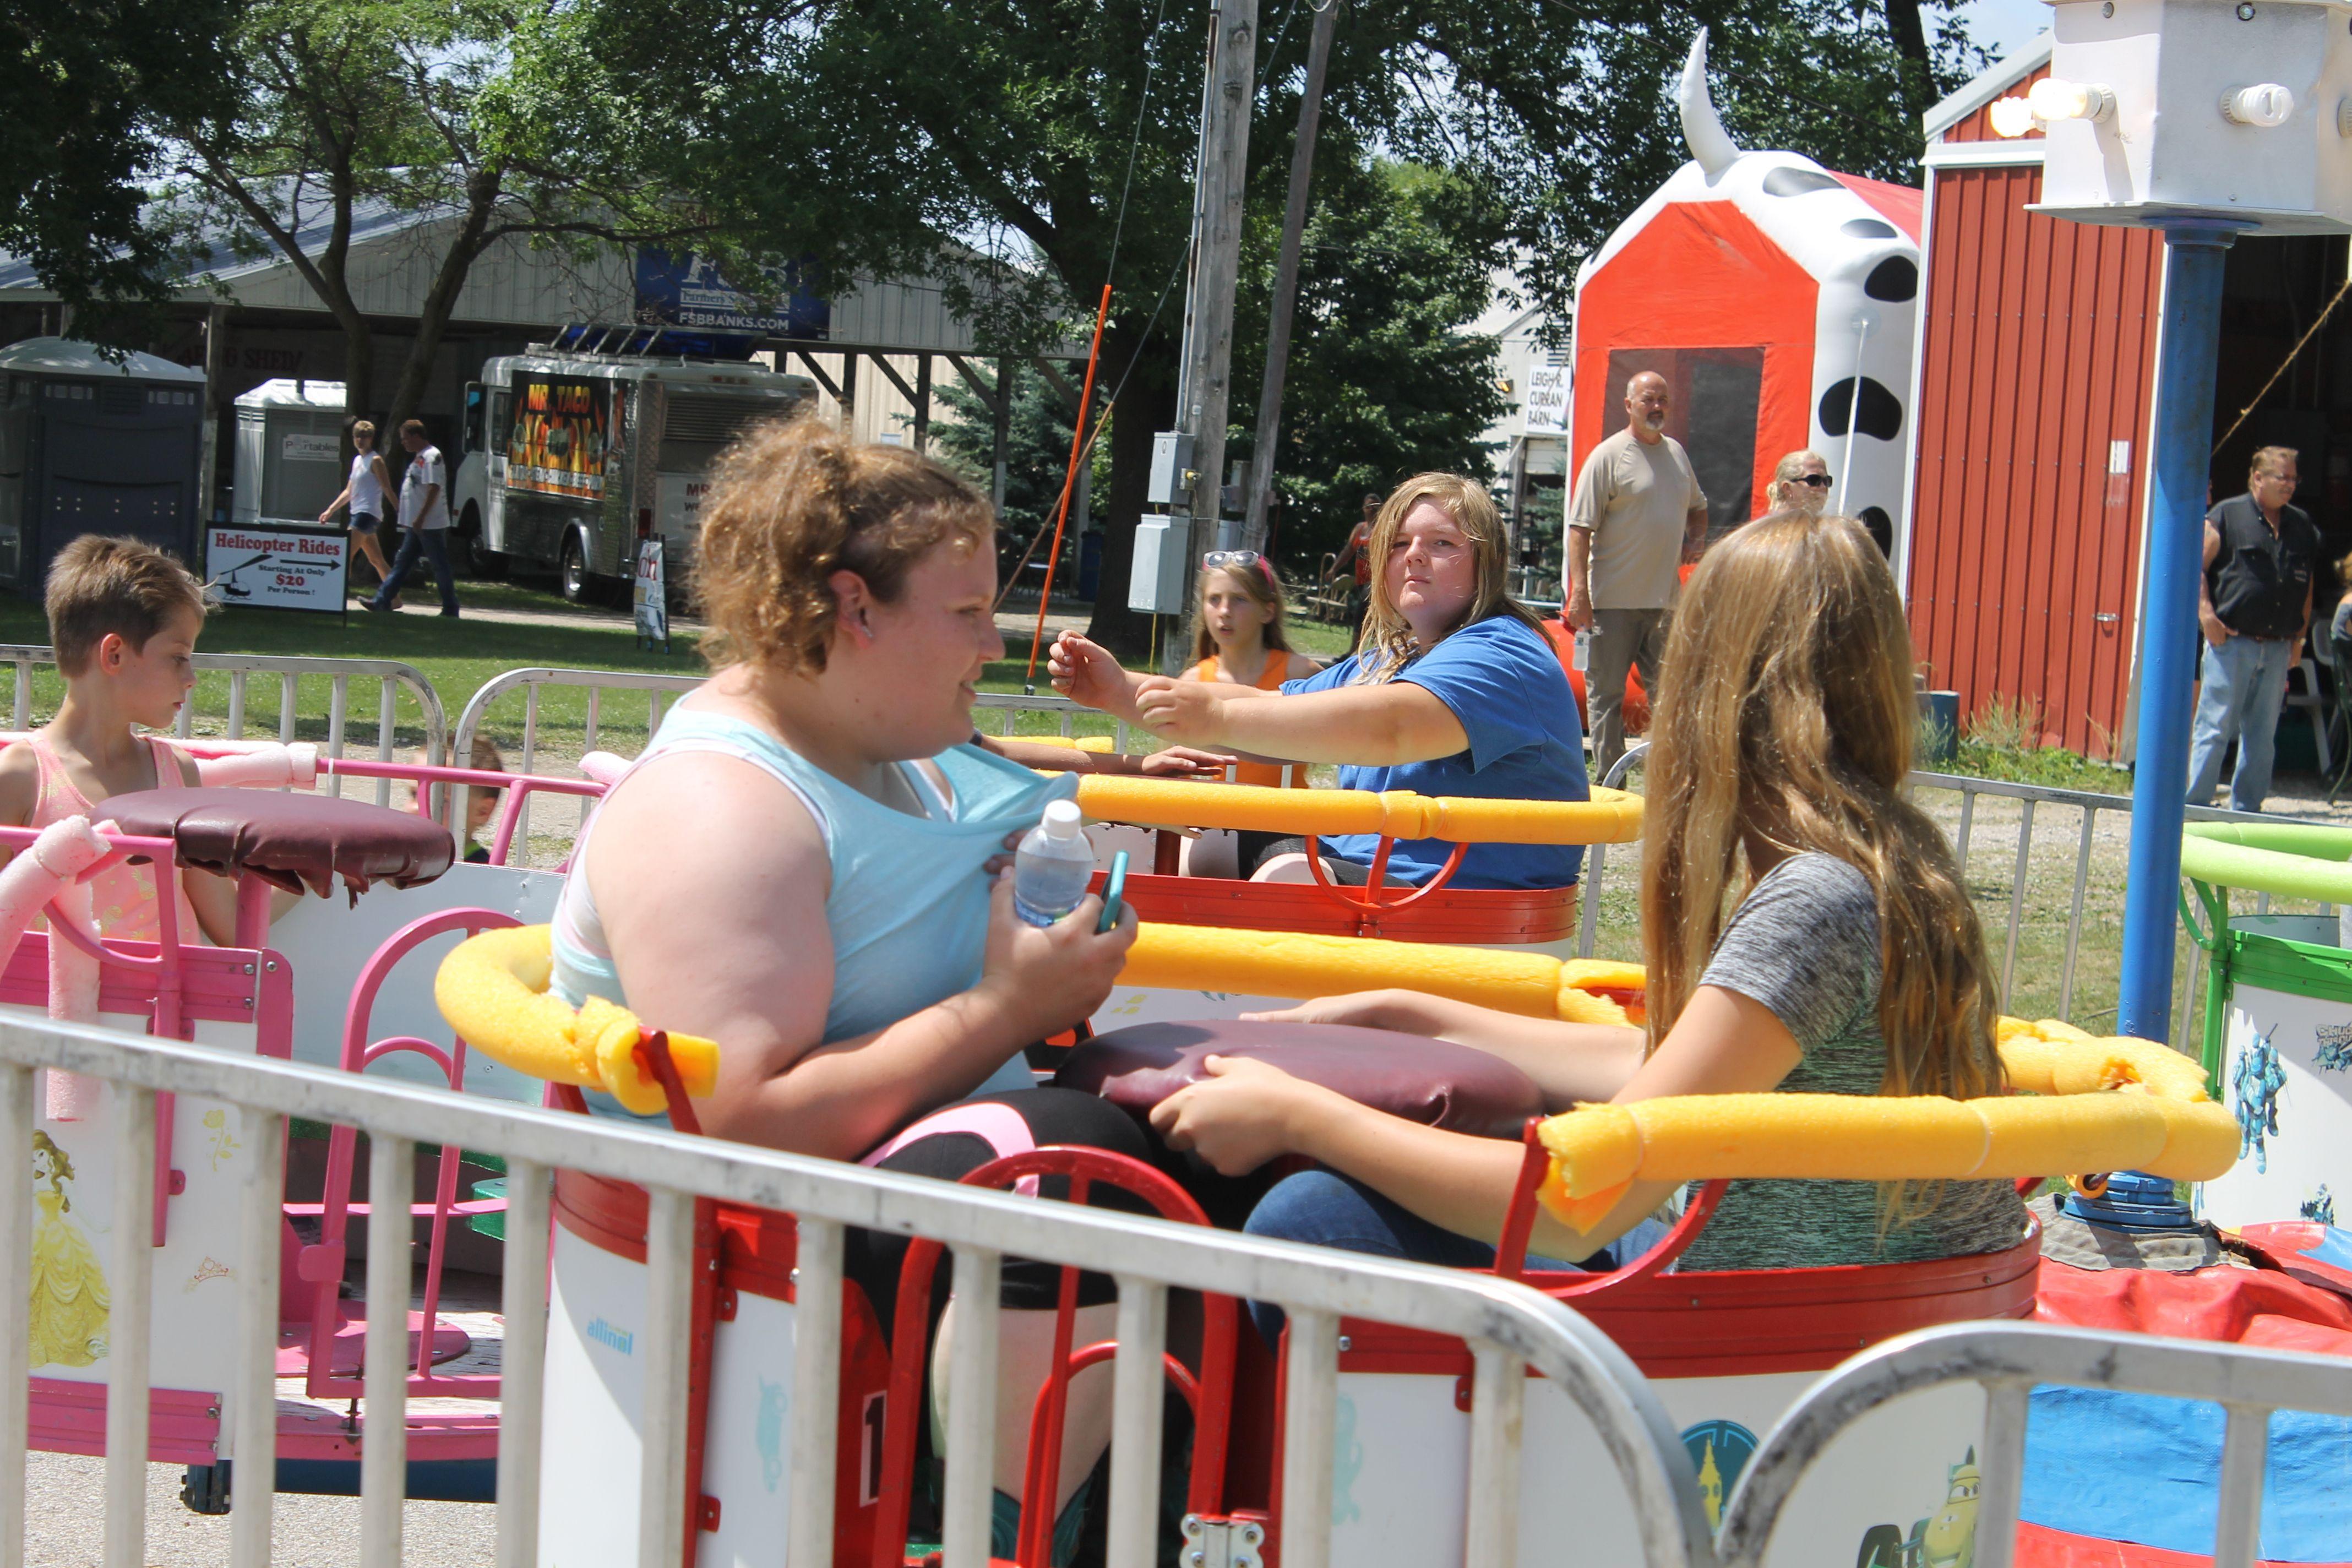 FREE carnival rides at the North Iowa Fair in Mason City ...